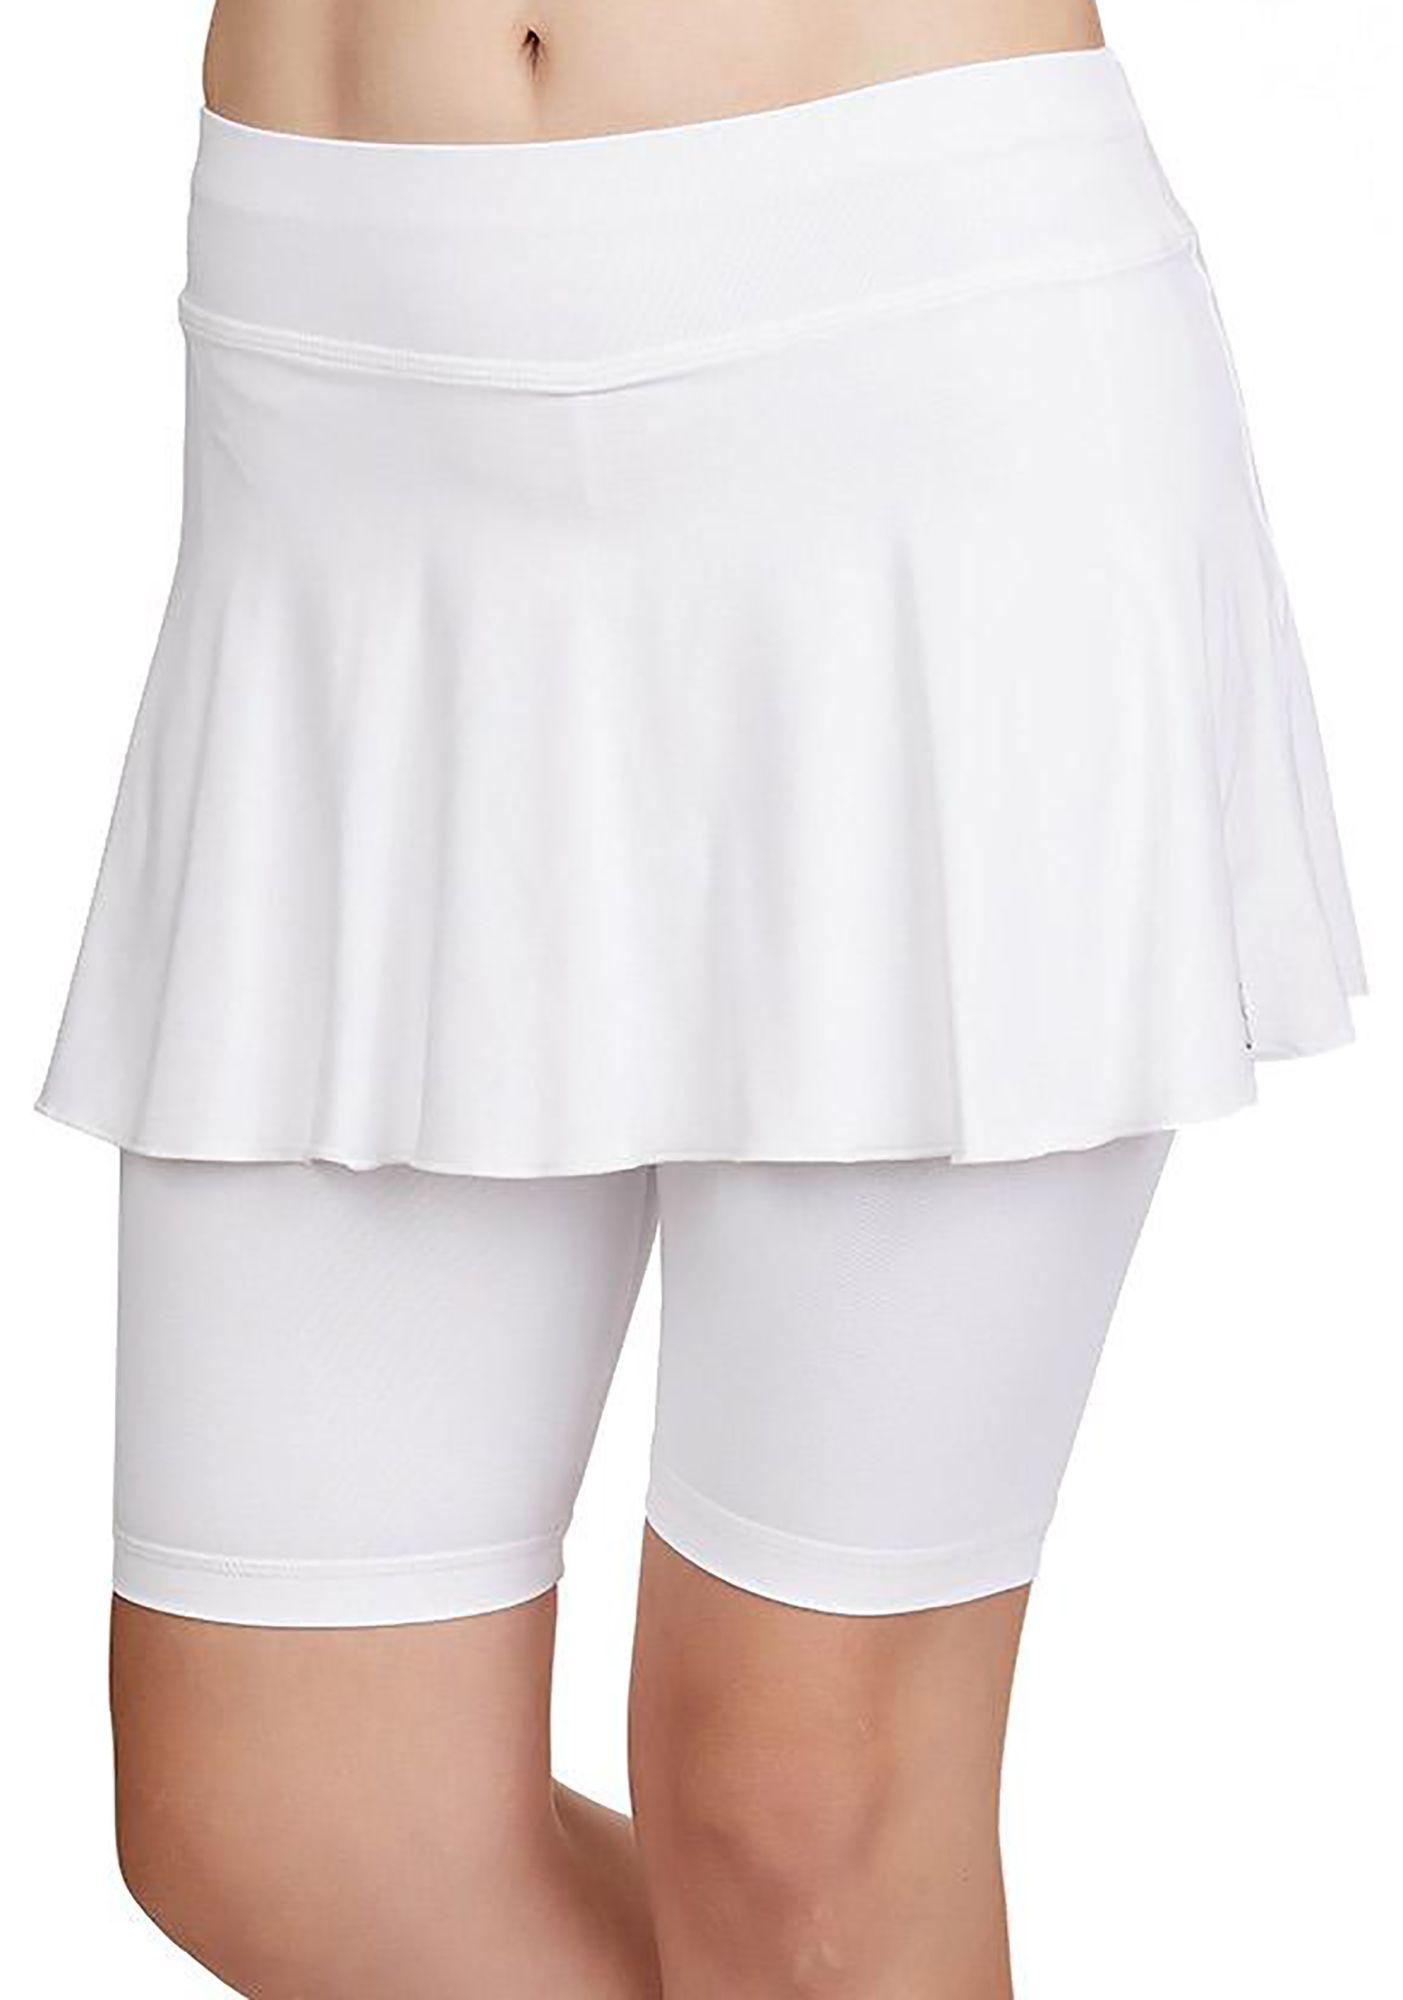 Sofibella Women's Jan Bermuda UV Skort, XS, White